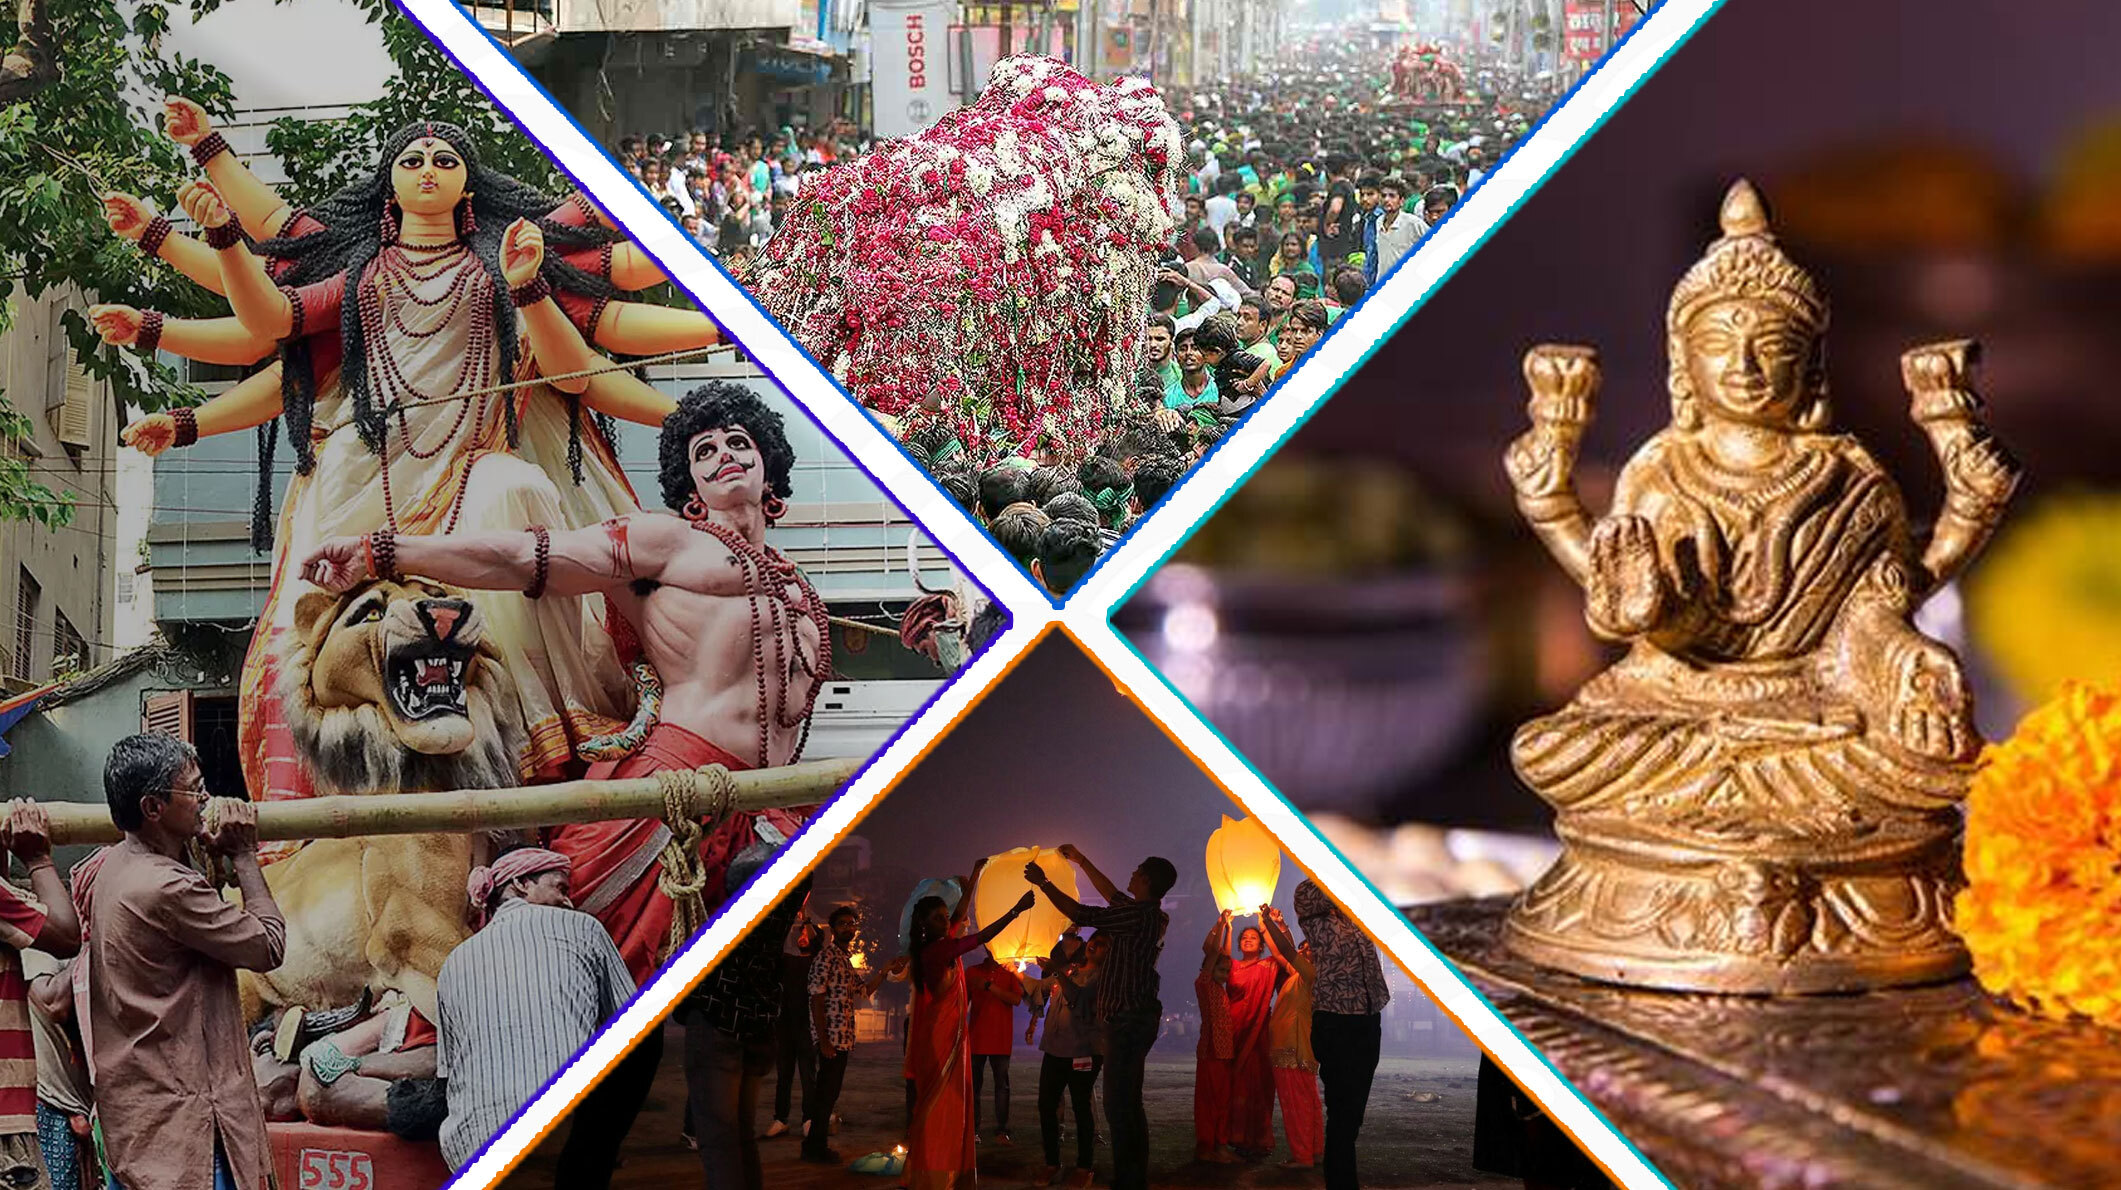 Festival Celebration in Asansol